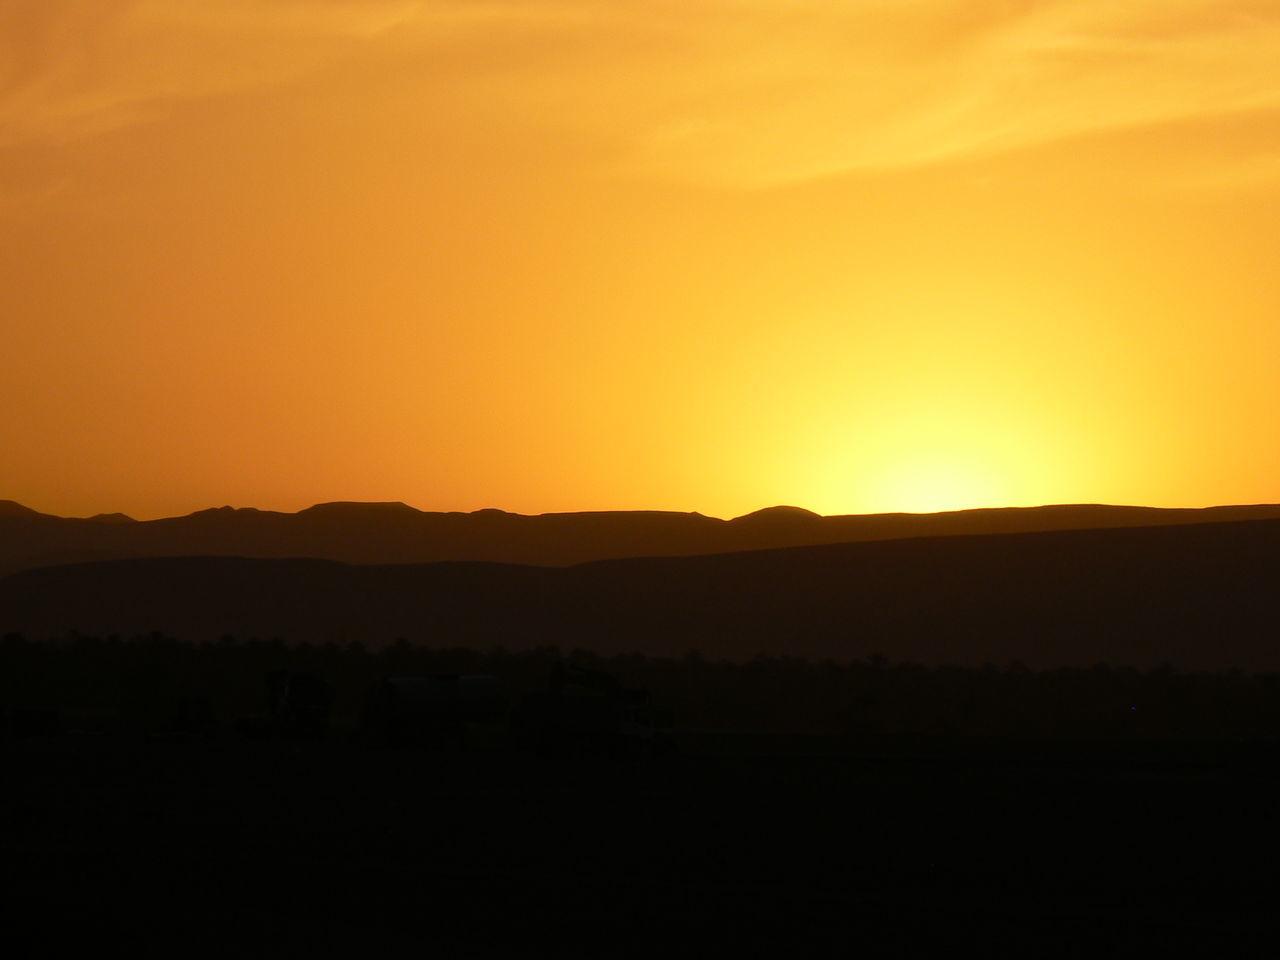 Beauty In Nature Desert Nature No People Orange Color Sun Sunset Vibrant Color